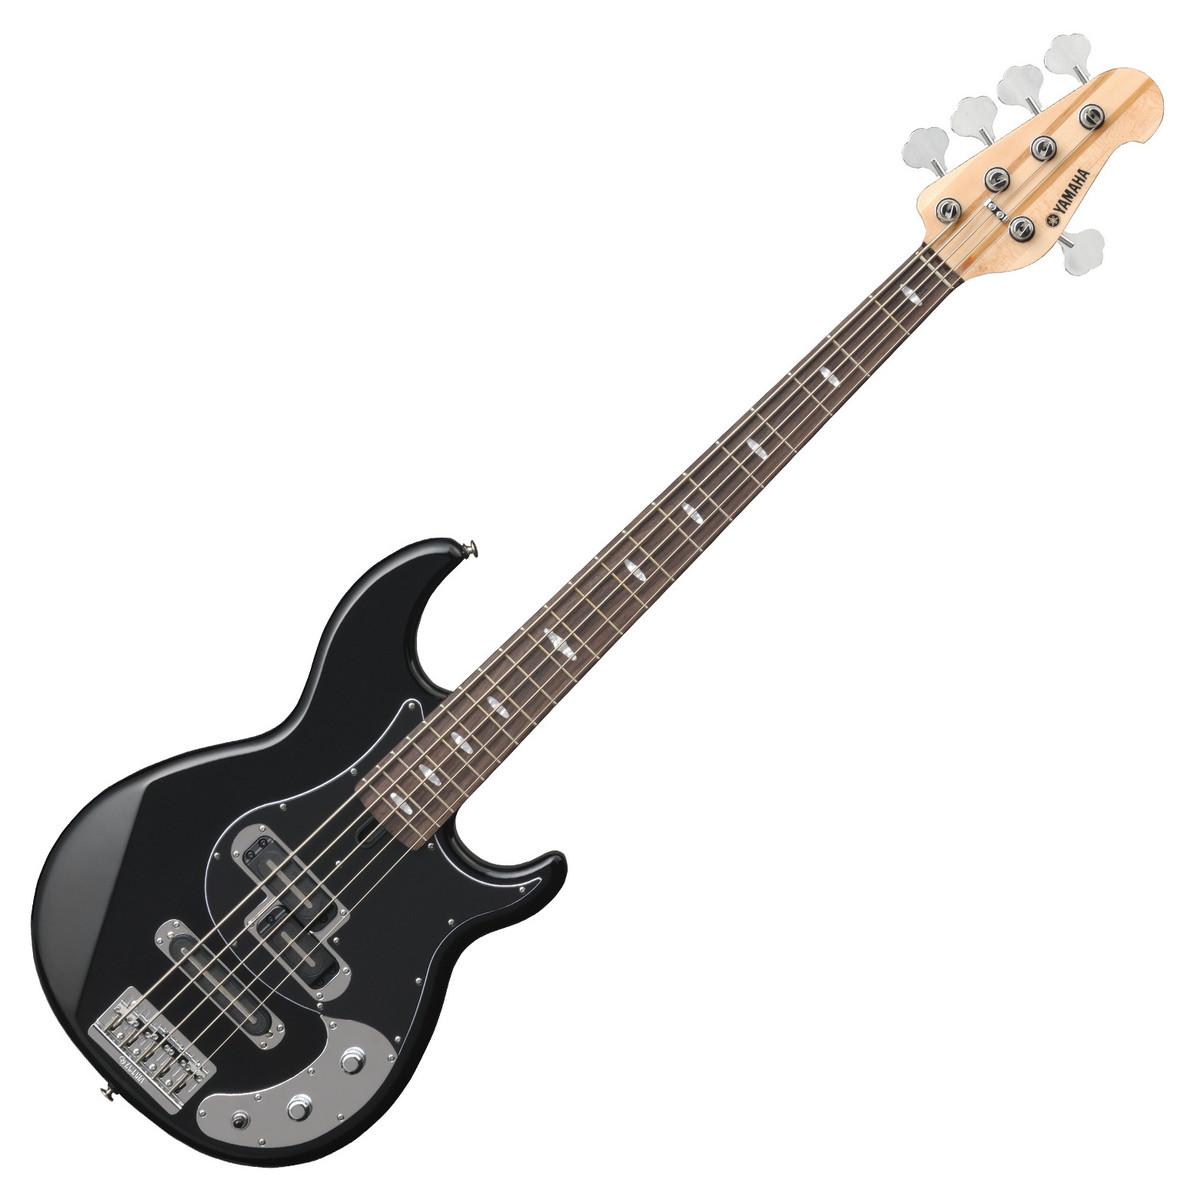 Yamaha bb1025x 5 string bass guitar black at for Yamaha bass guitars